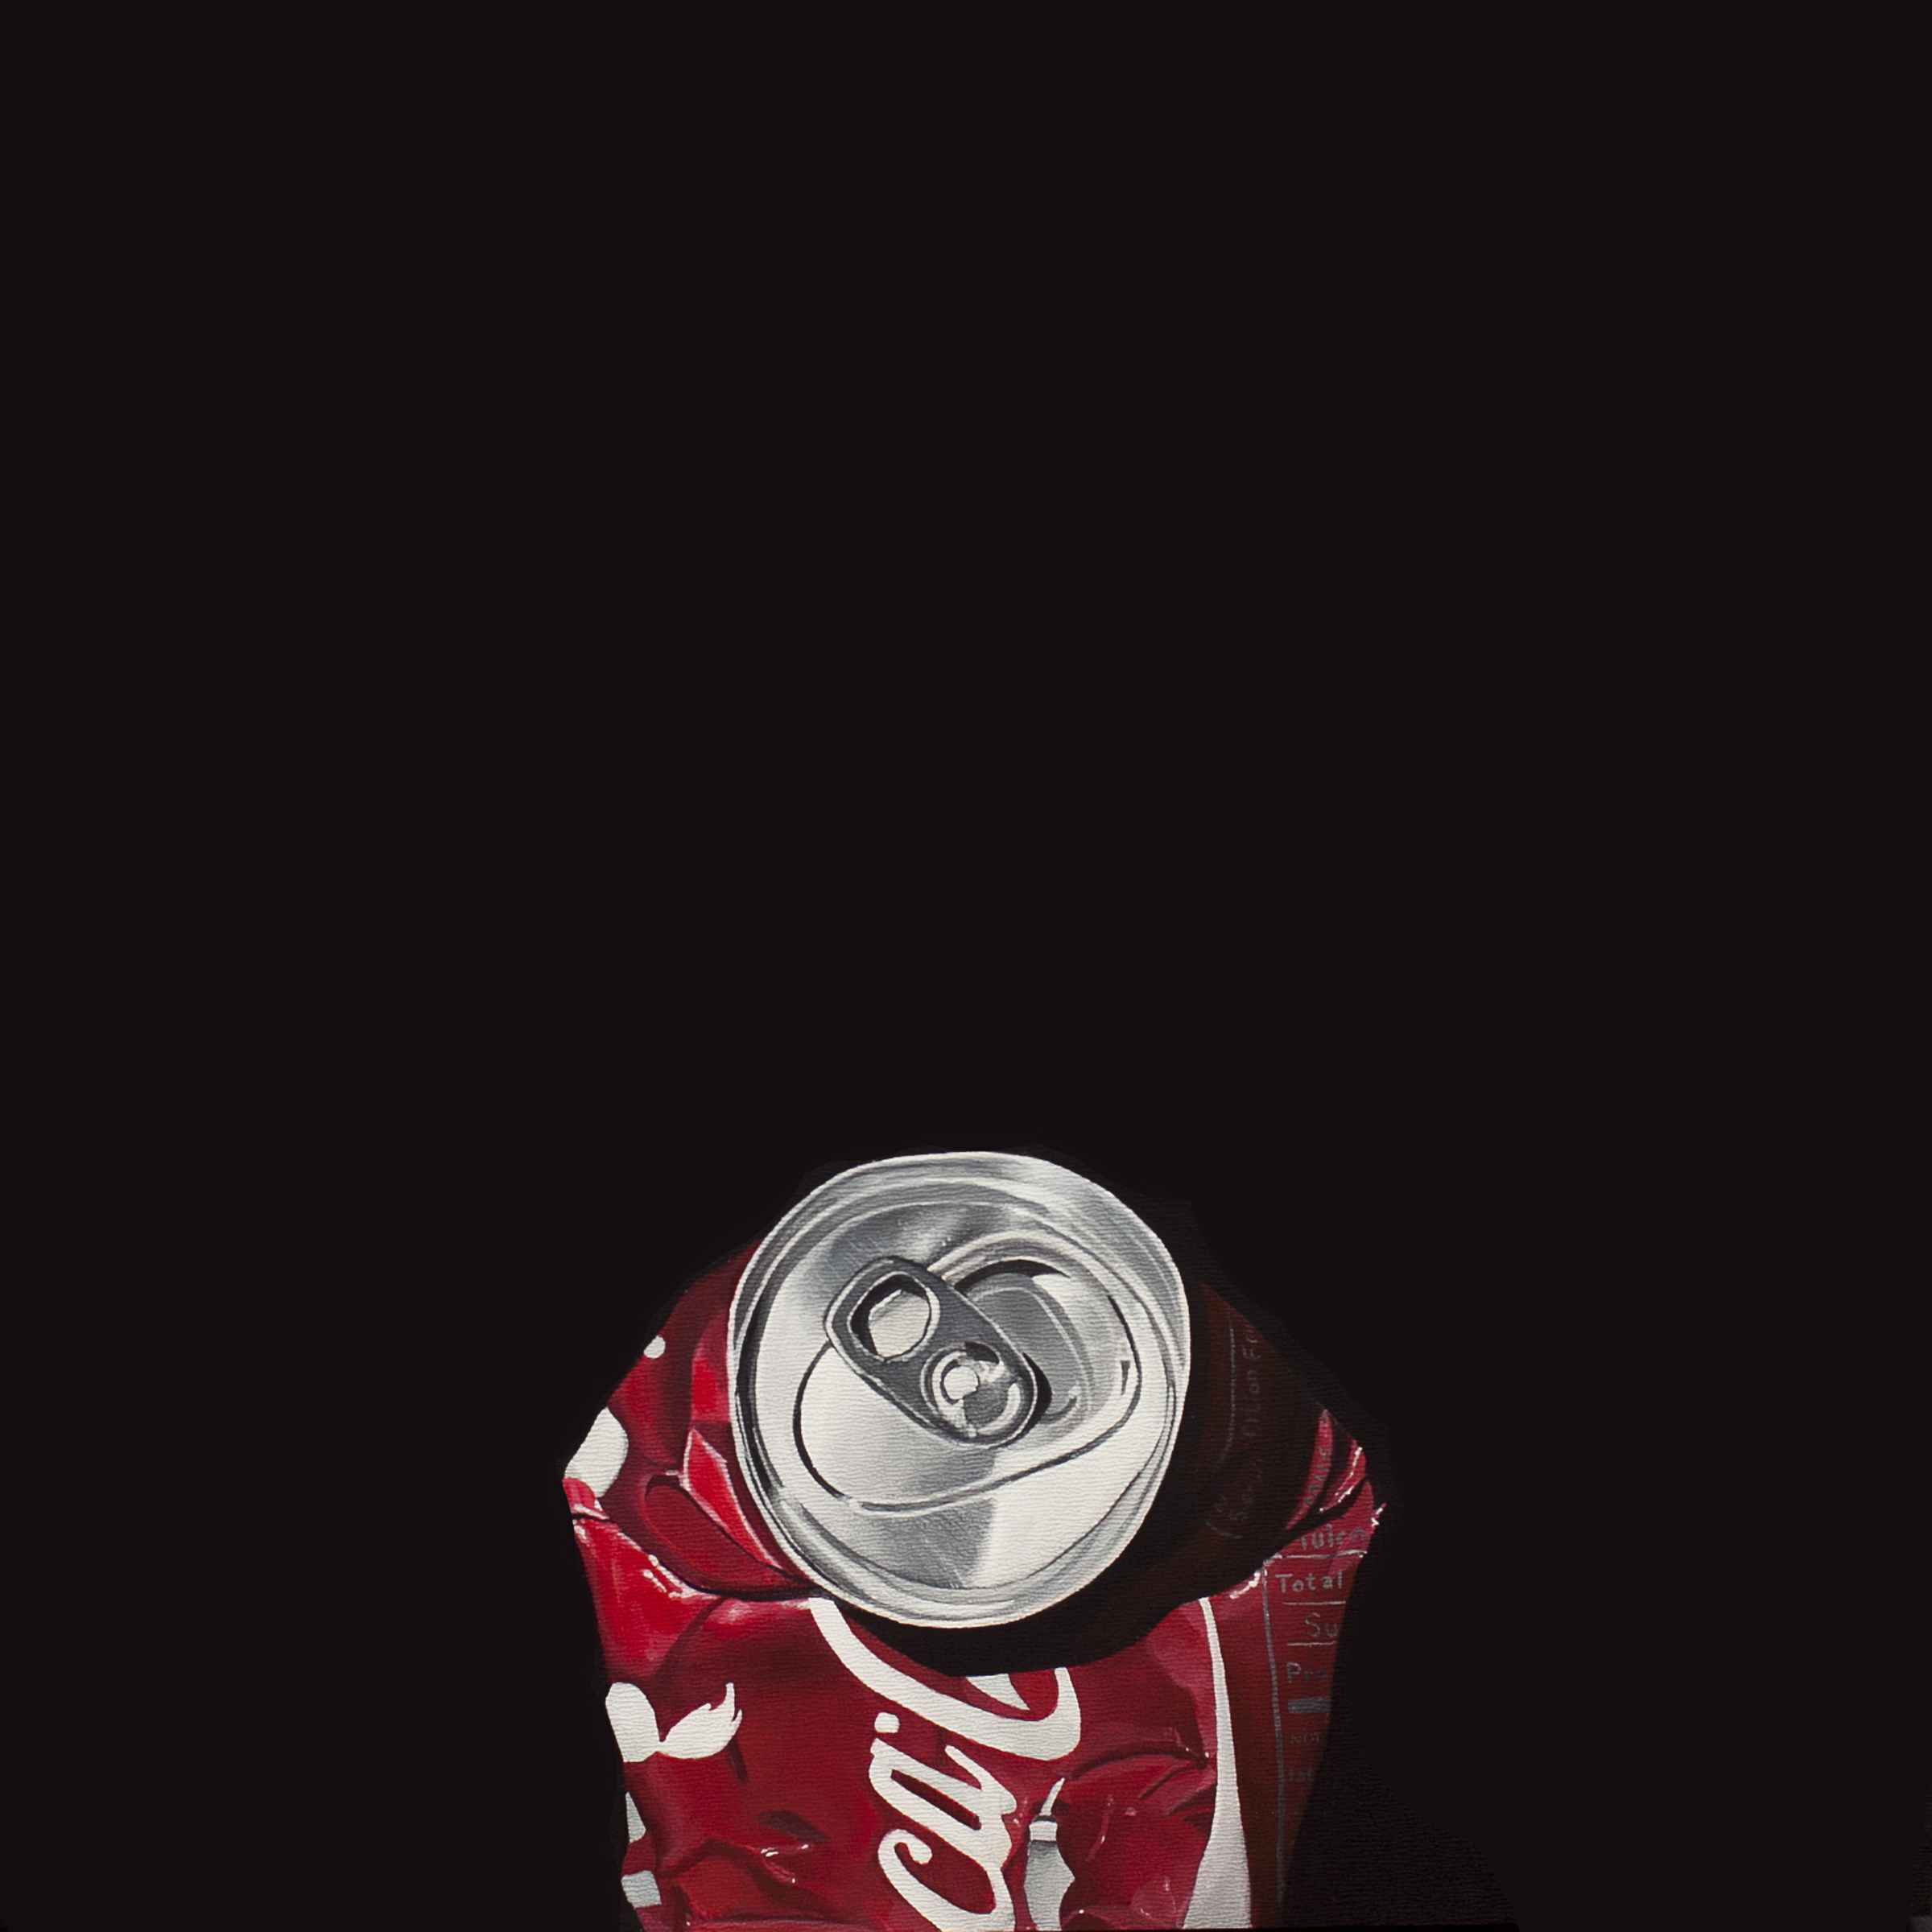 Crushed Coke Can No. 1  by  James Zamora